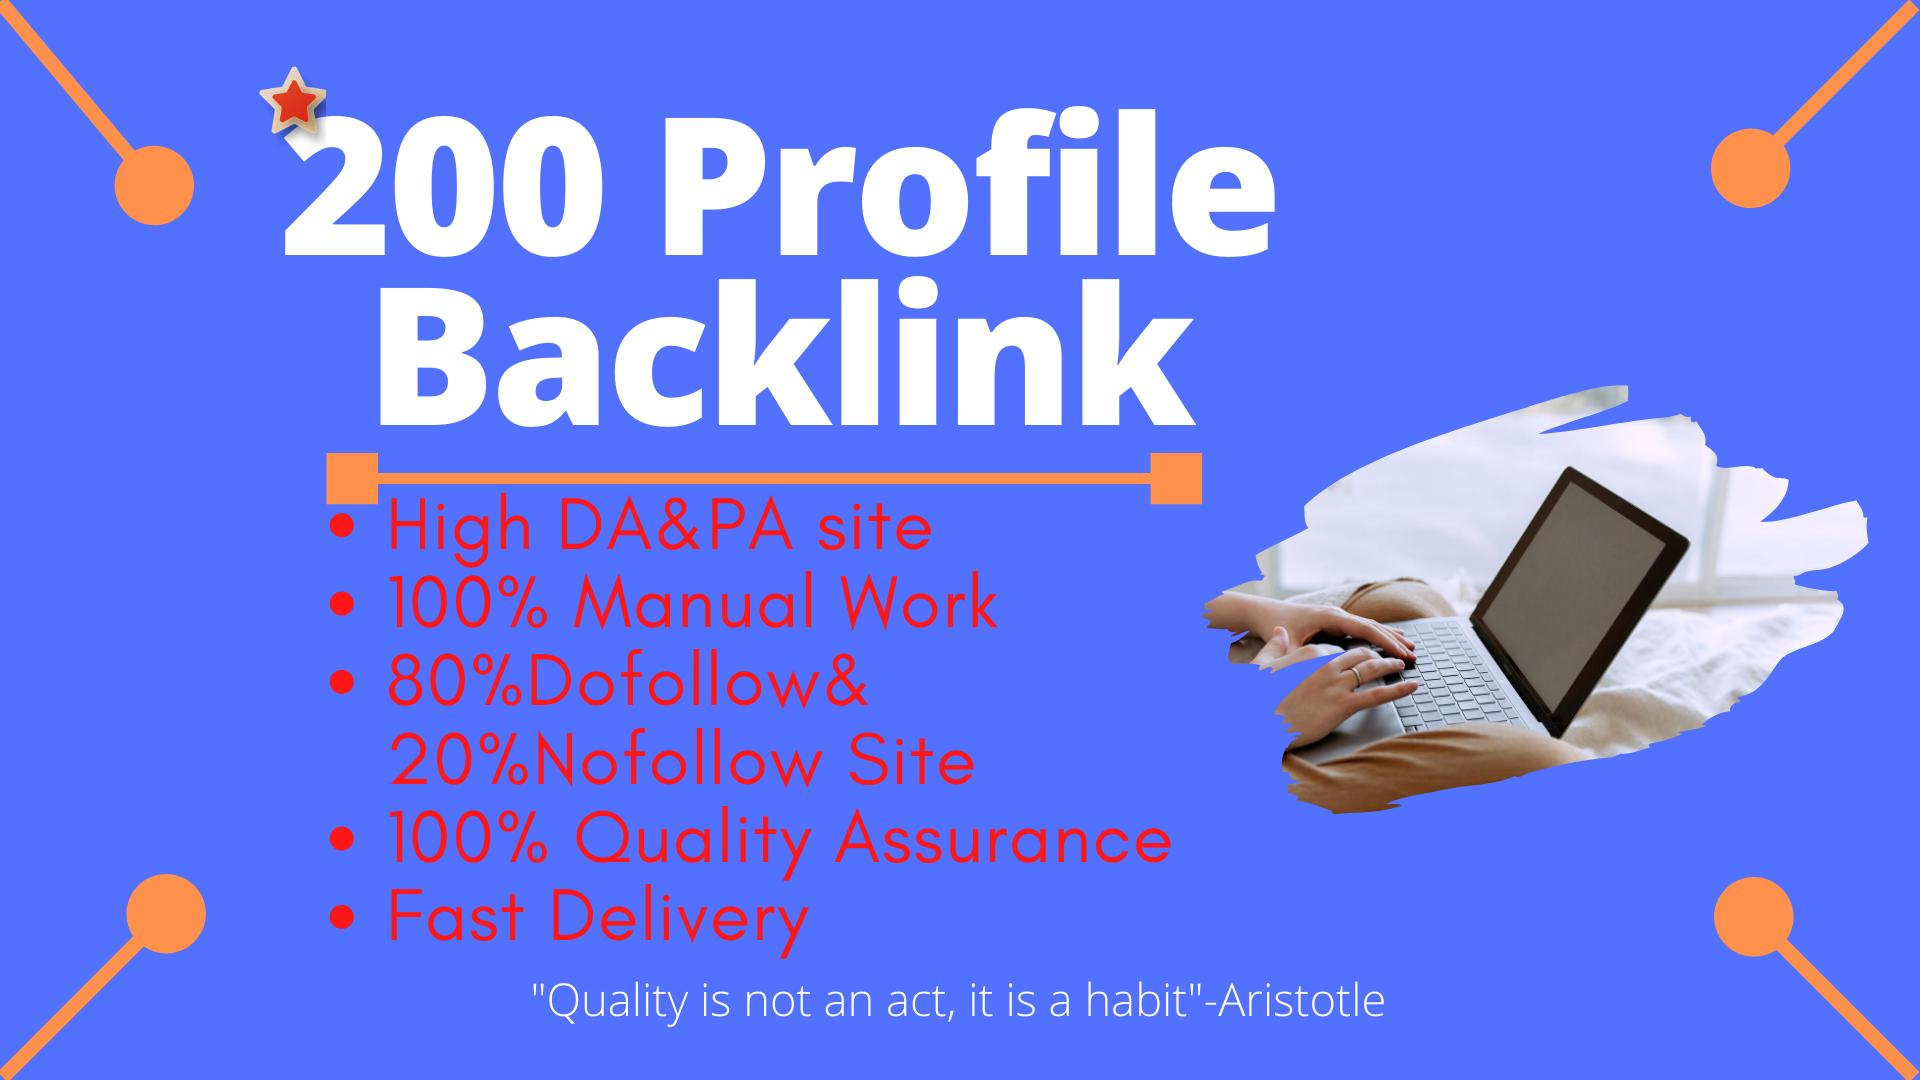 I Will Create Manually 200 Profile Backlinks on High DA & PA sites